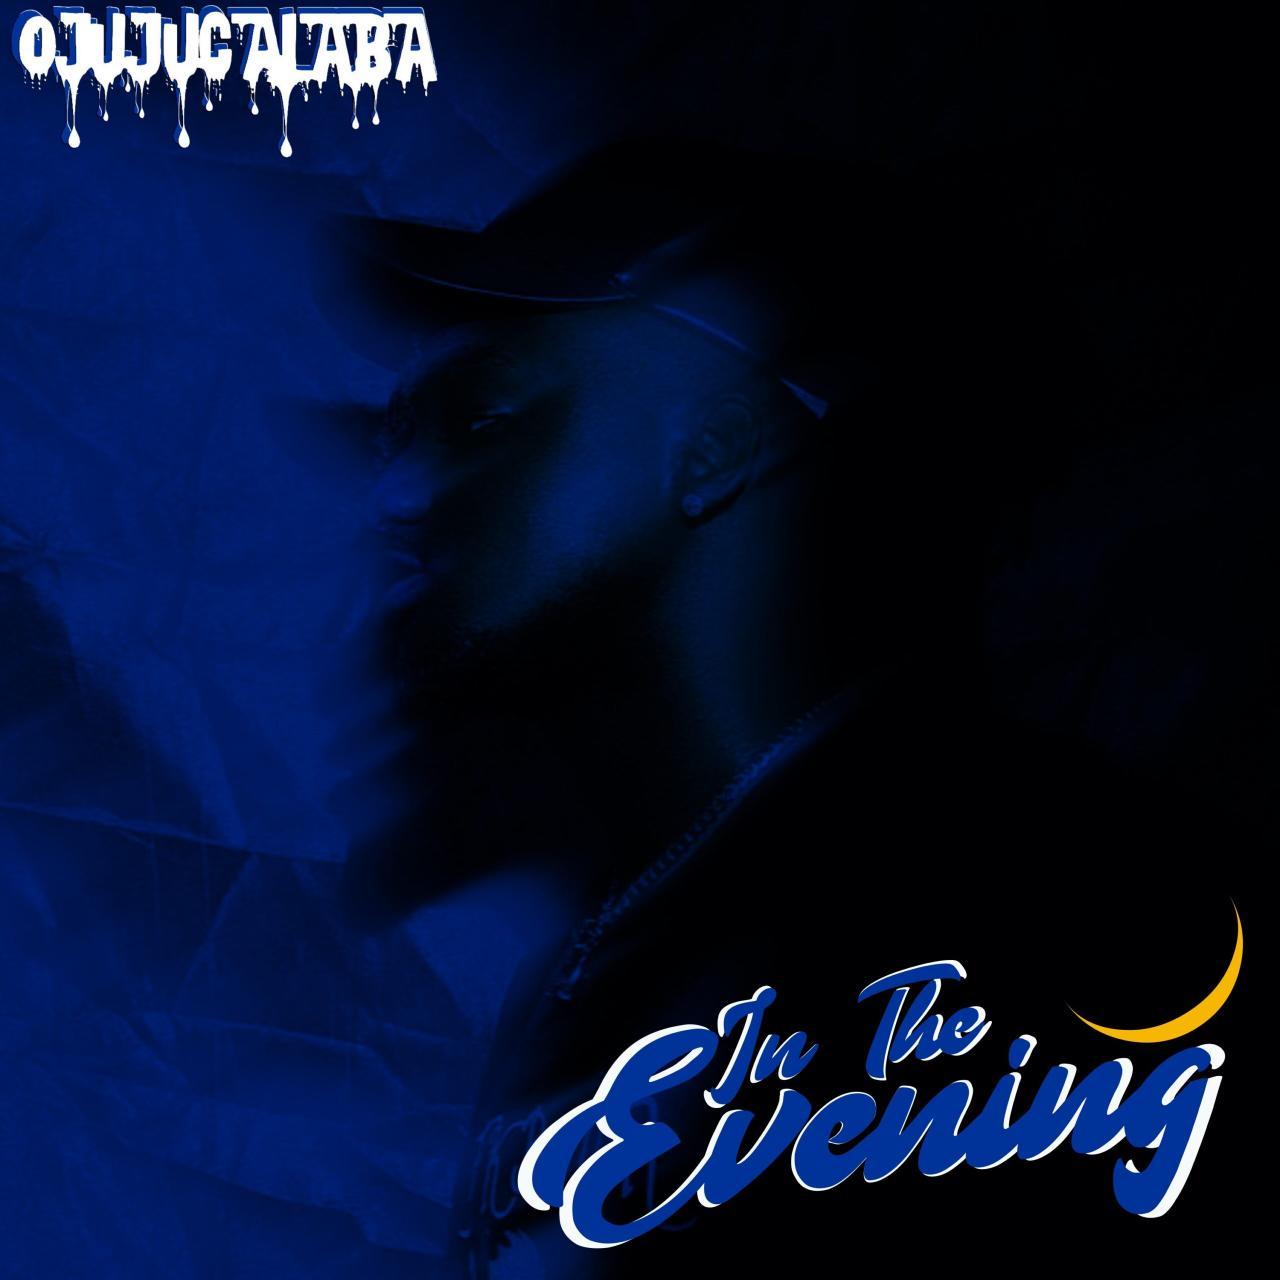 Ojujucalaba - In The Evening (EP)